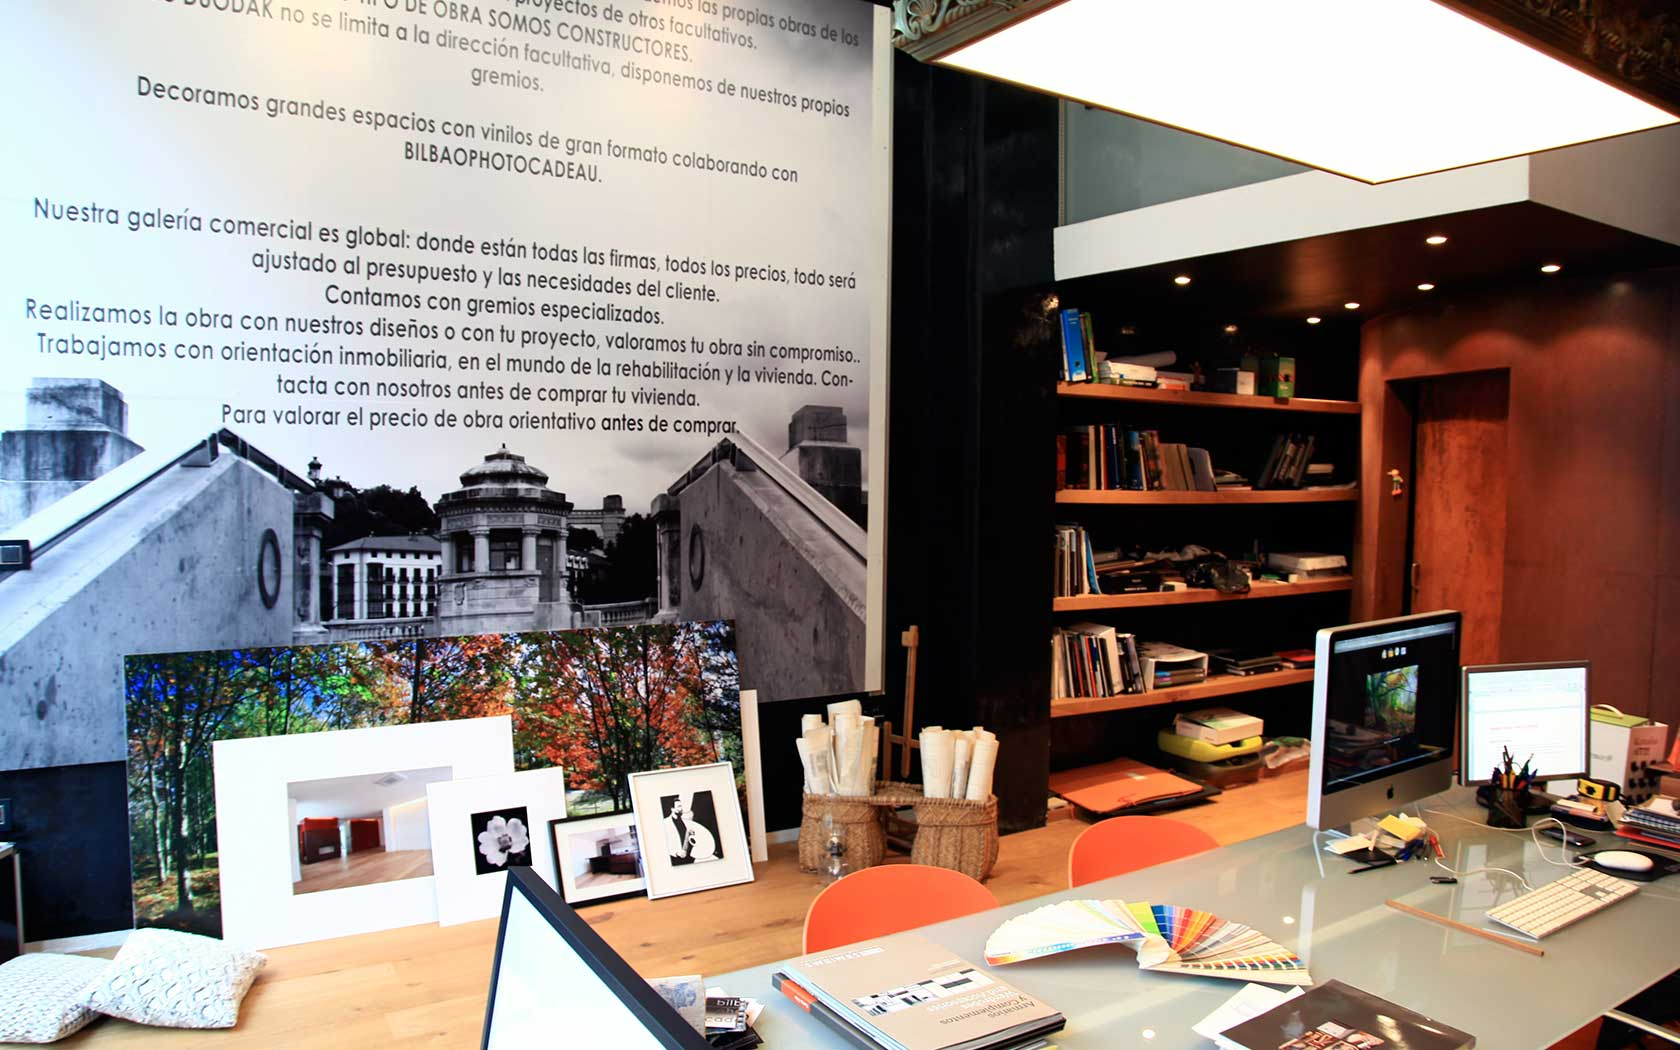 Duodak estudio de arquitectura en bilbao - Estudios arquitectura bilbao ...